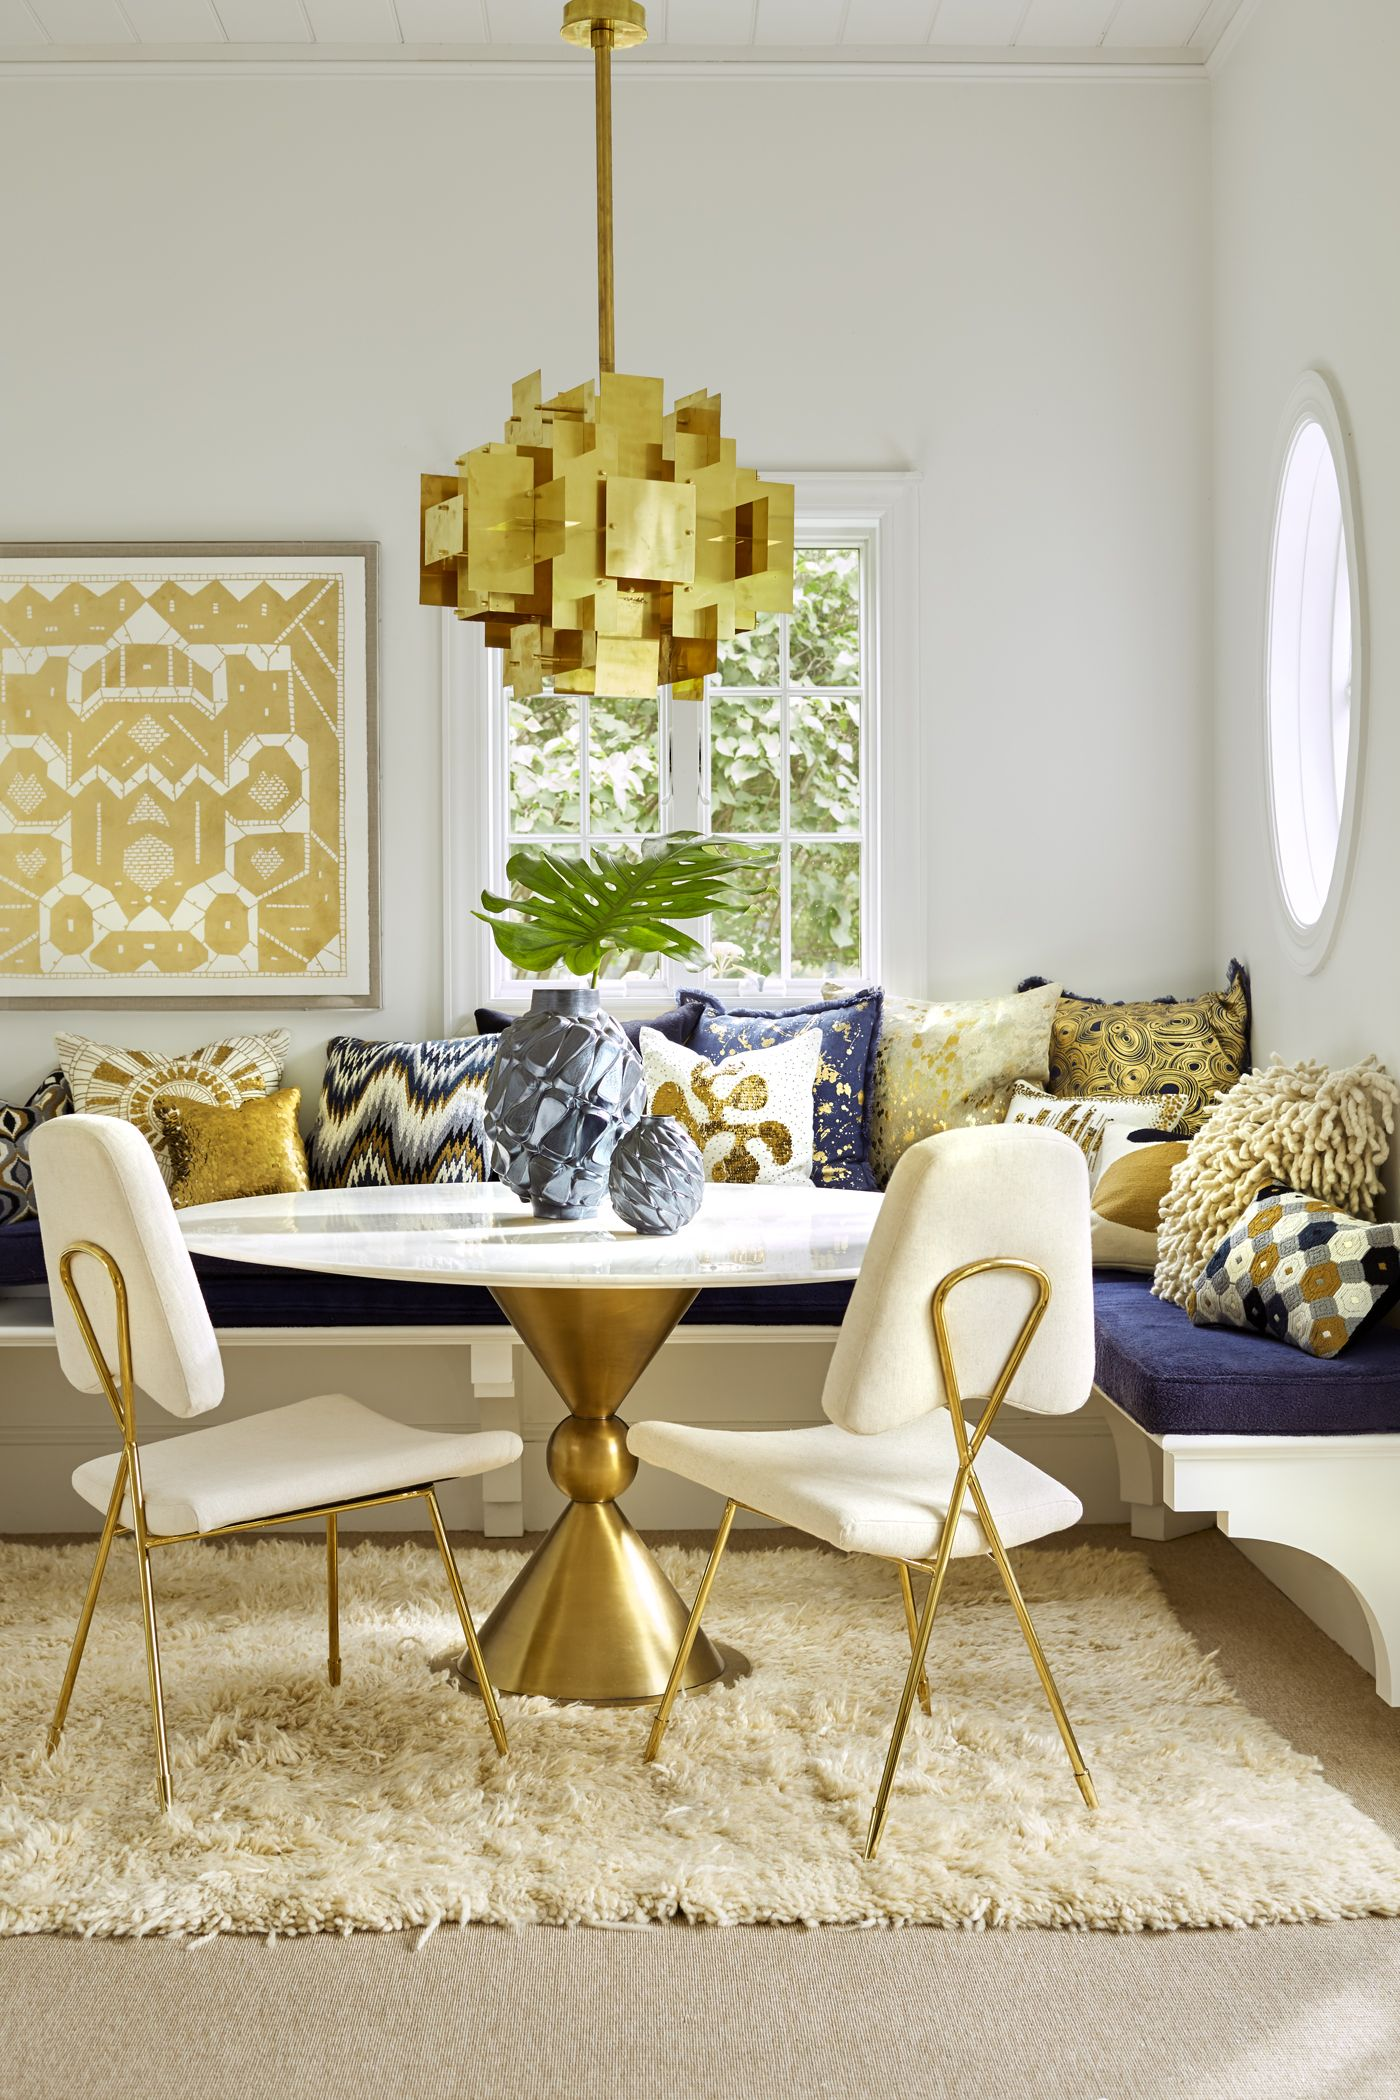 Jonathan Adler Dining Room Decor Dining Room Design Modern Modern Dining Table